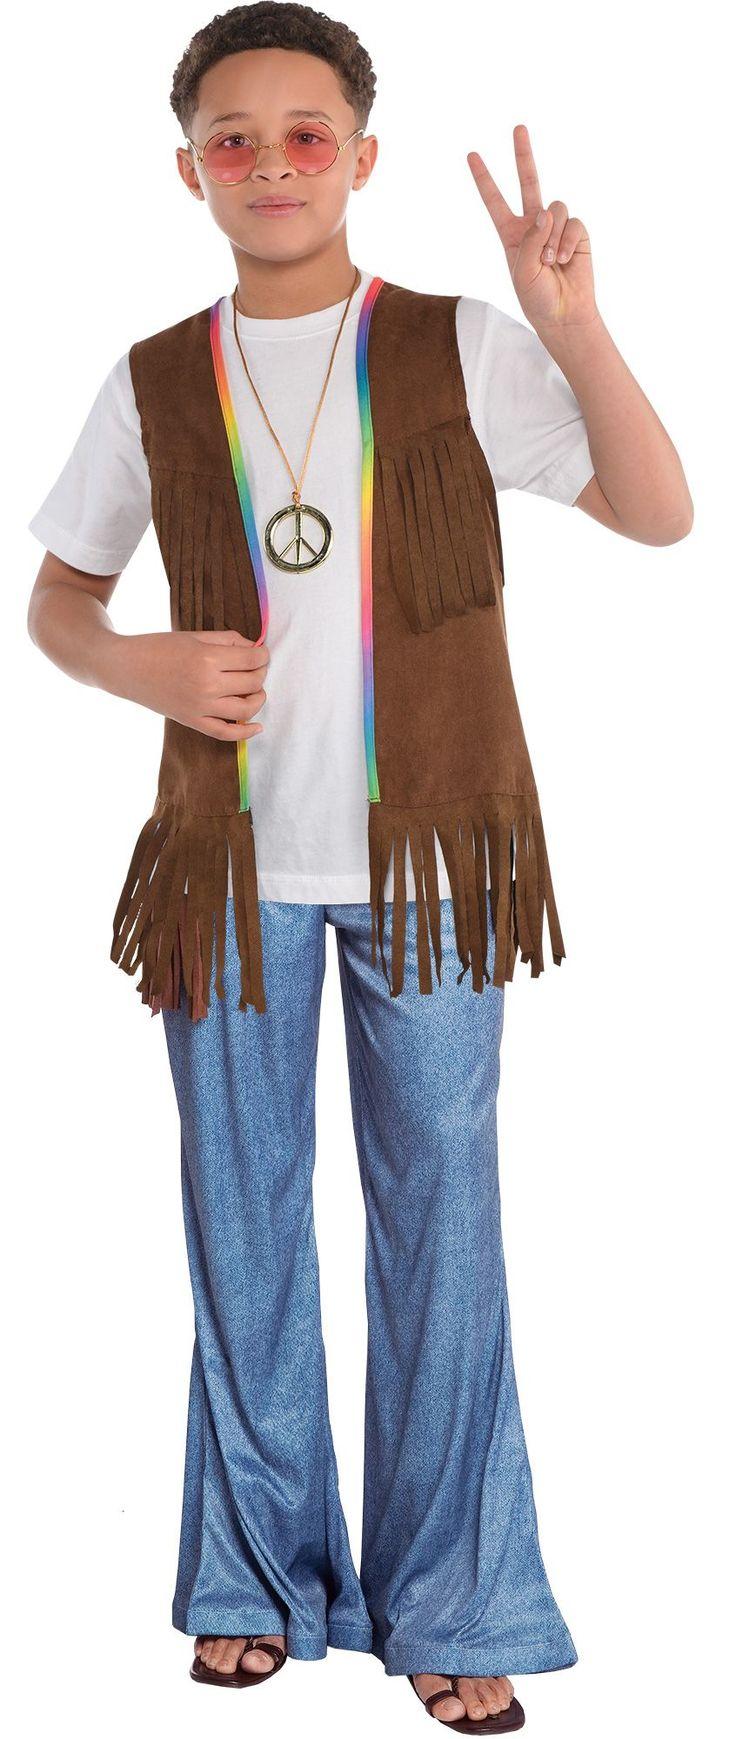 DIY Hippie costume